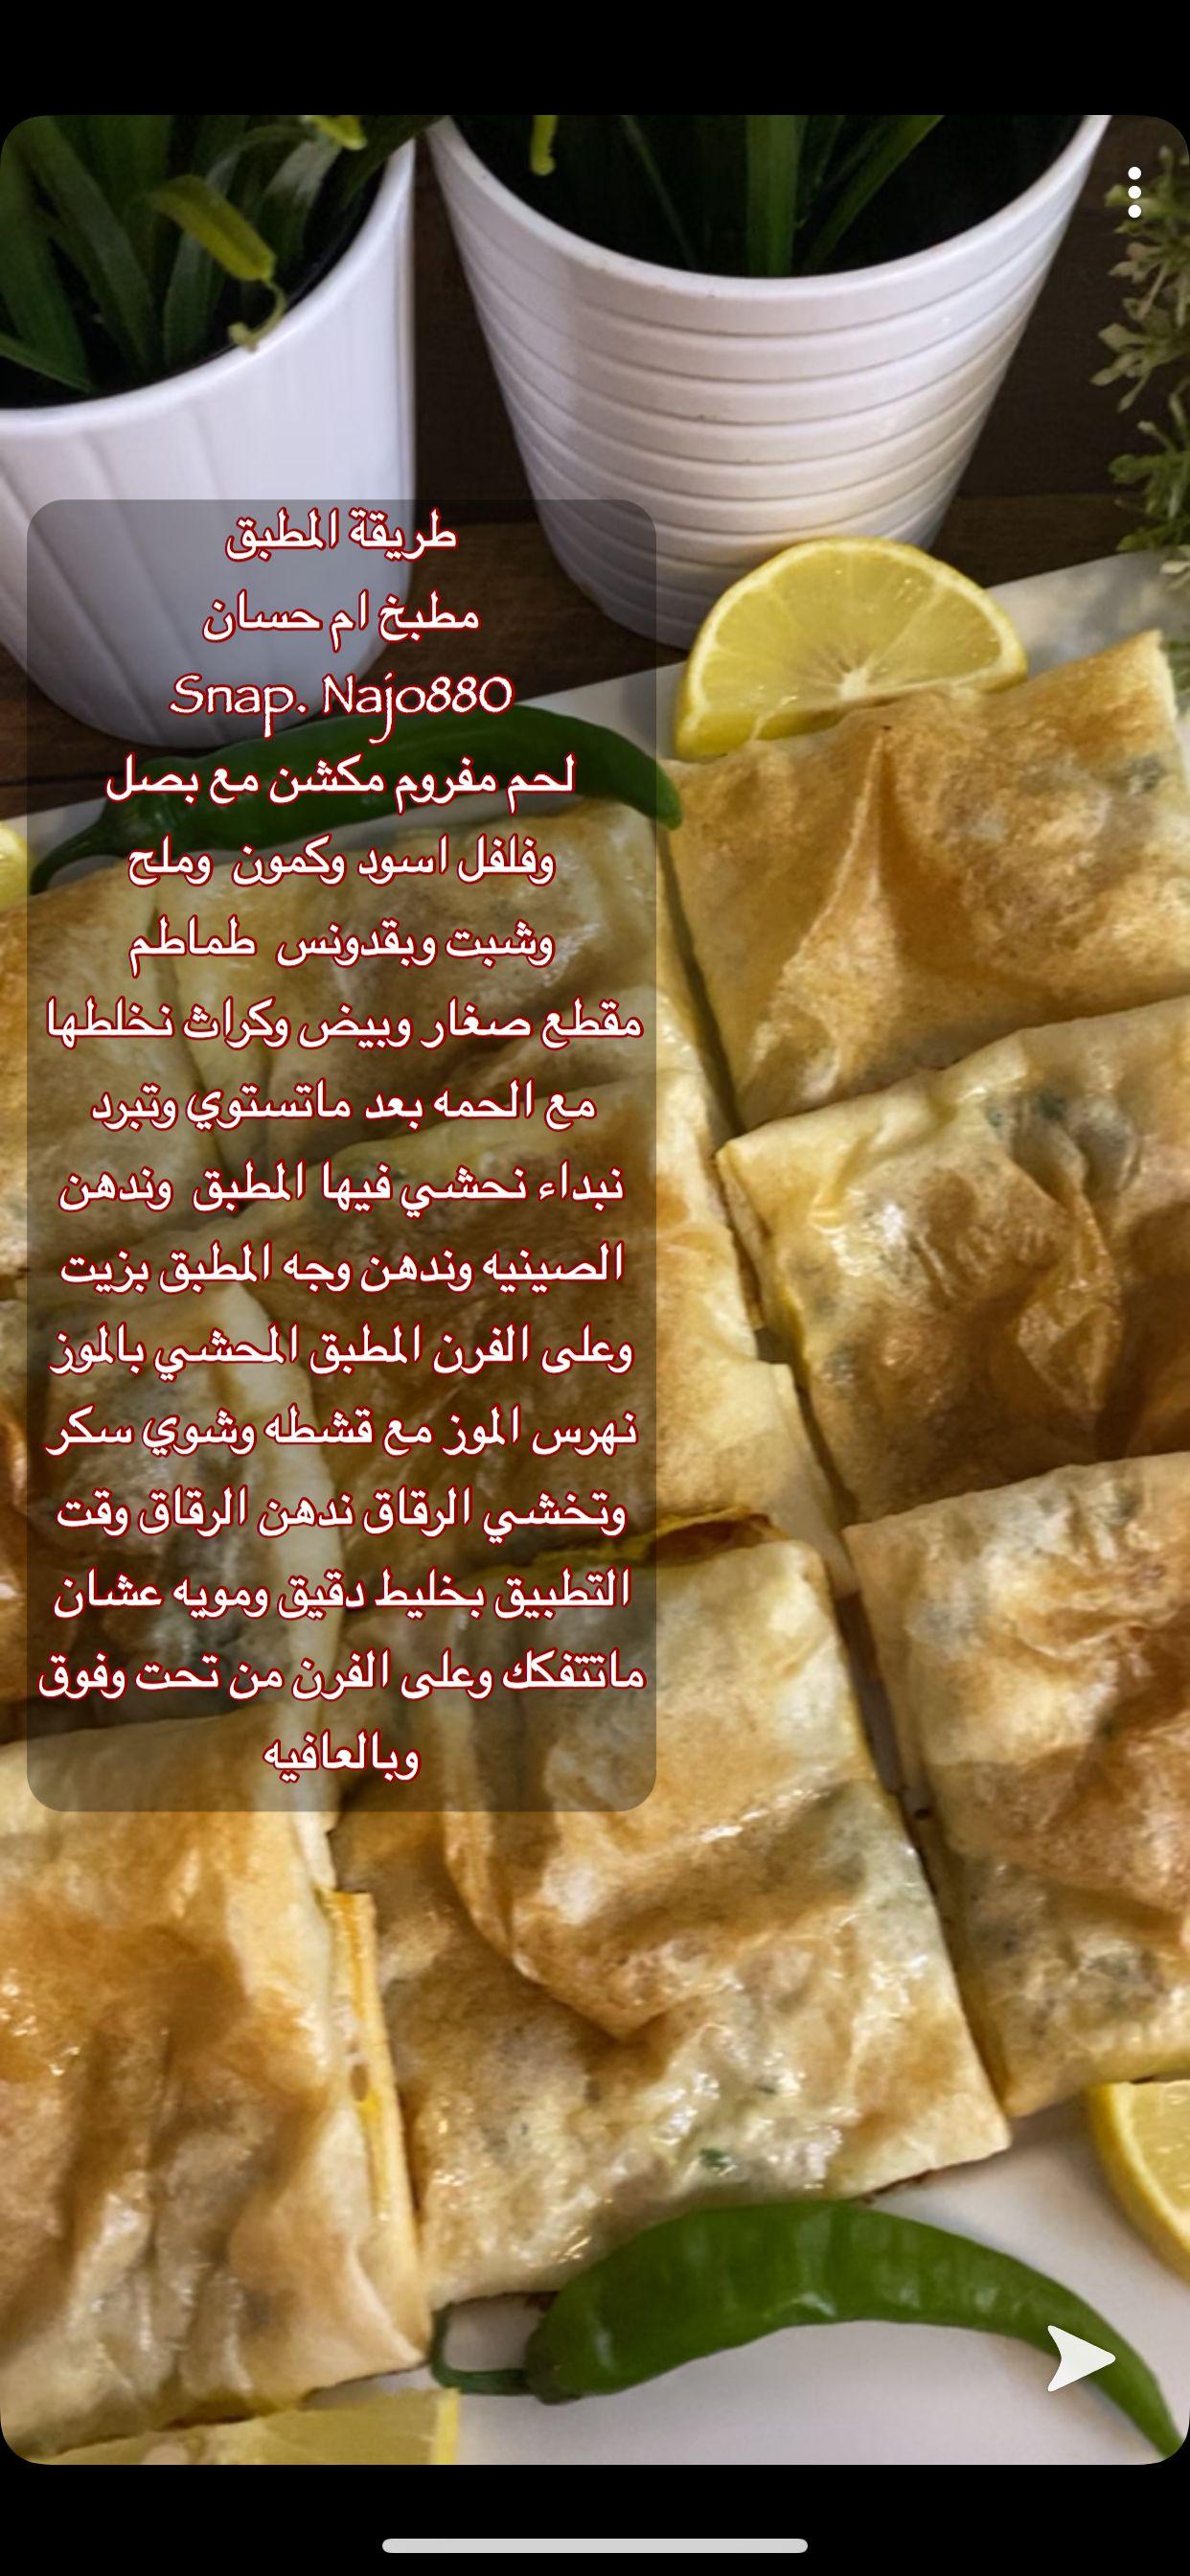 Pin By Noora On طبخات Food Dishes Food Recipies Food